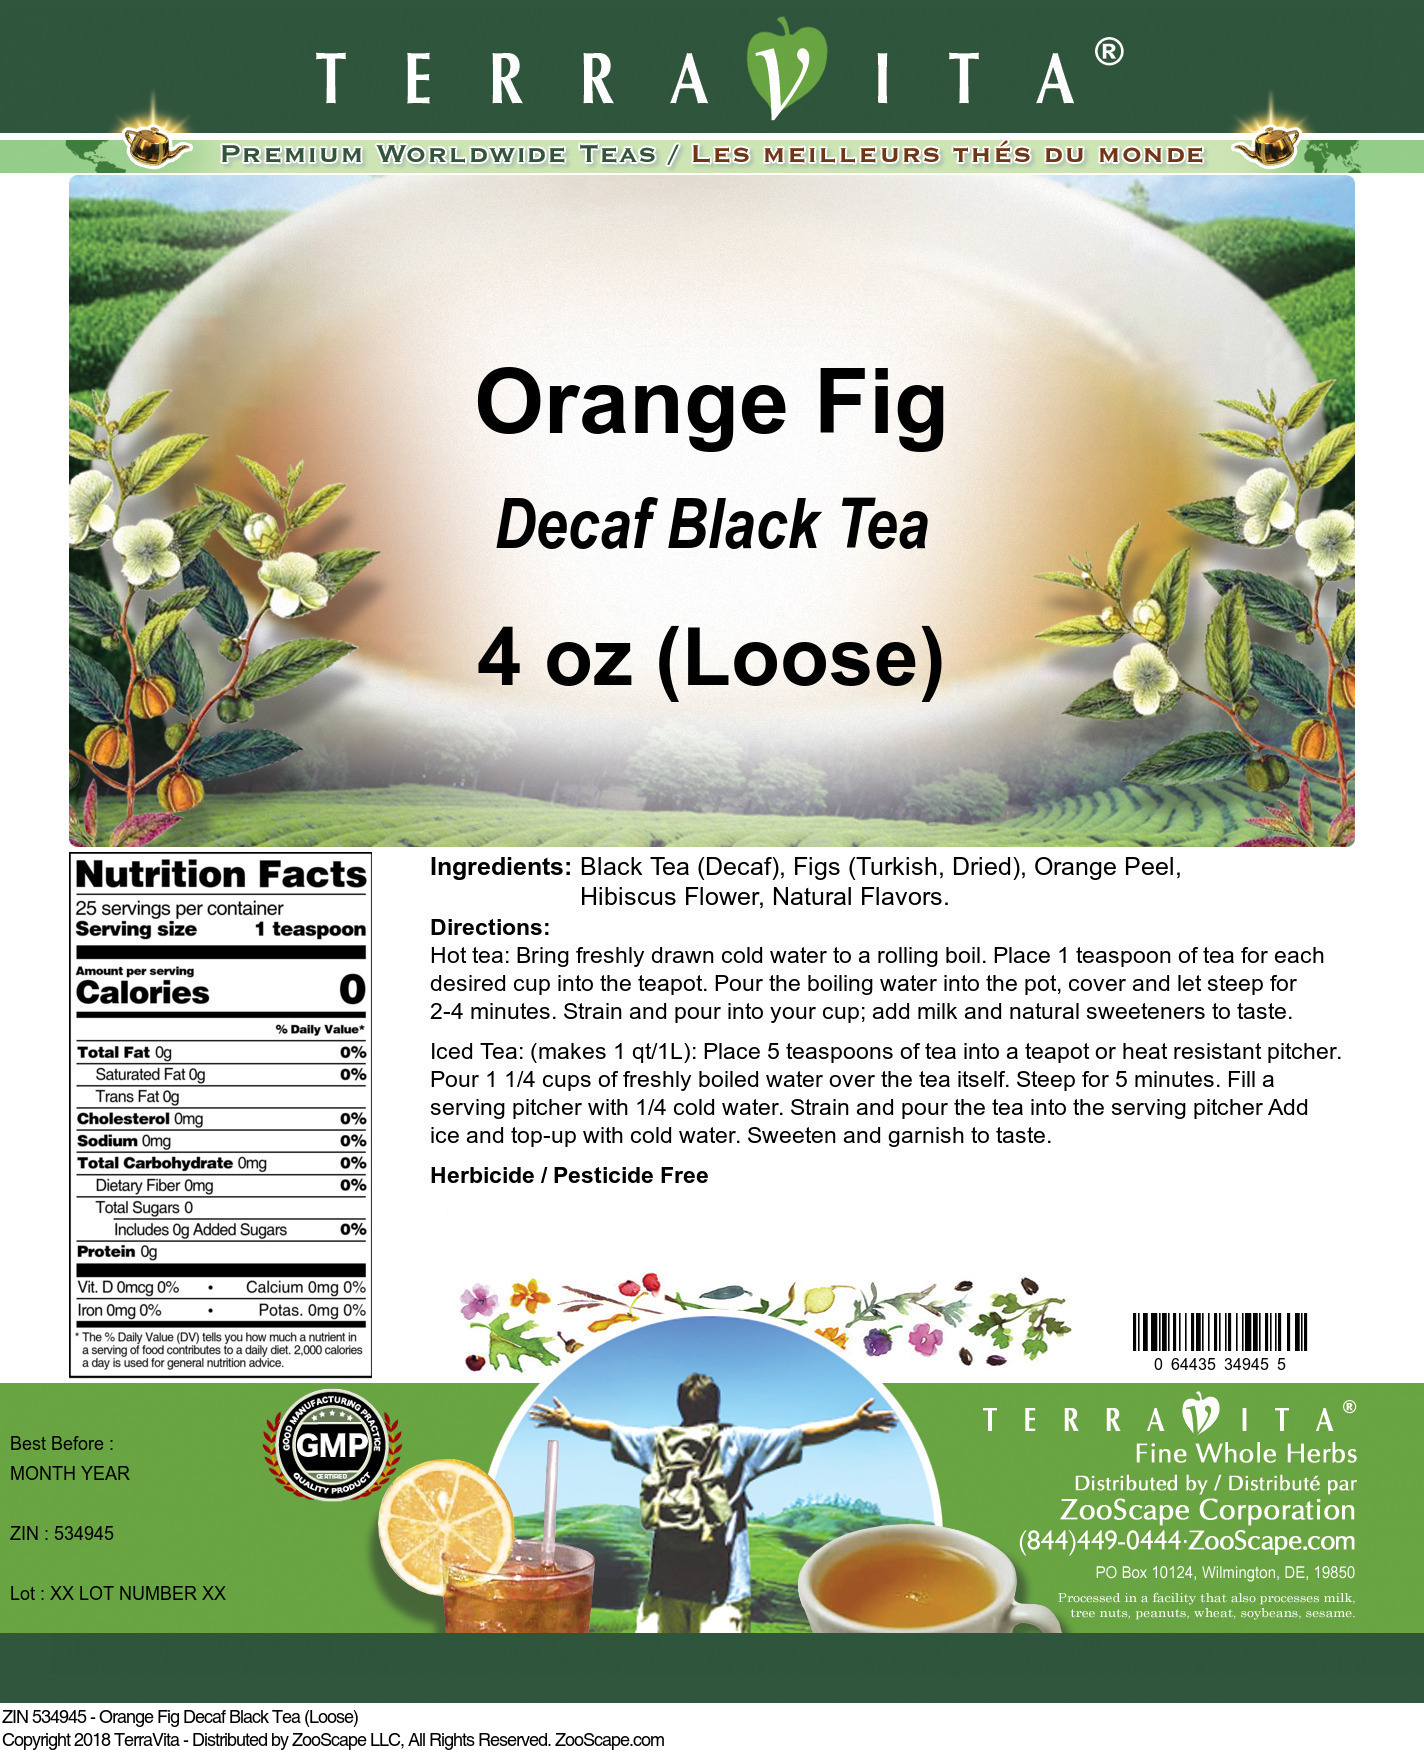 Orange Fig Decaf Black Tea (Loose)